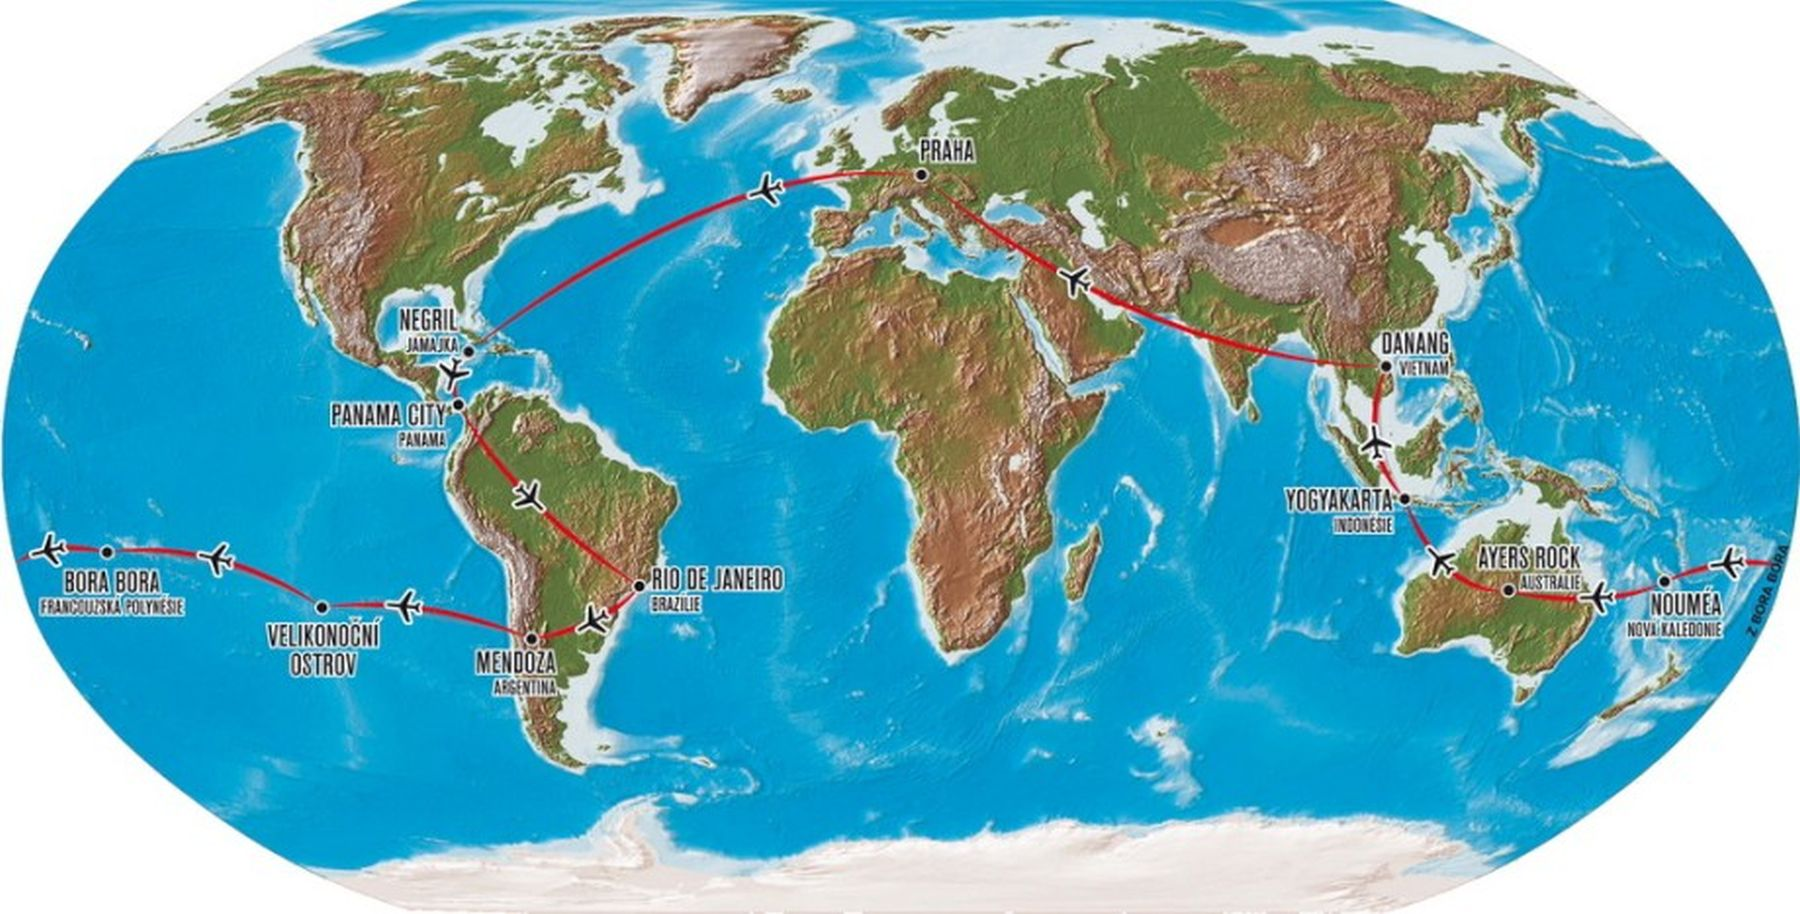 bora bora mapa sveta Cesta kolem světa 2015 | cestykolemsveta.cz bora bora mapa sveta